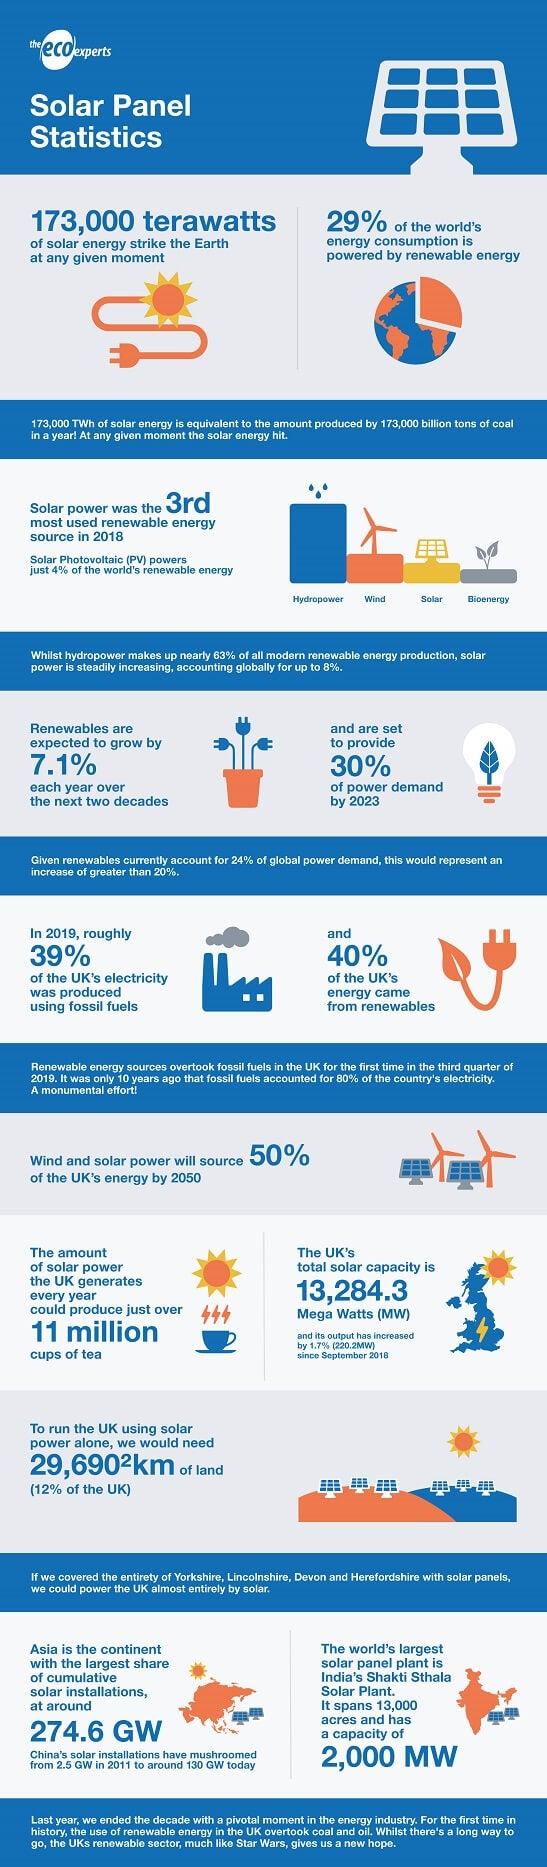 Solar statistics